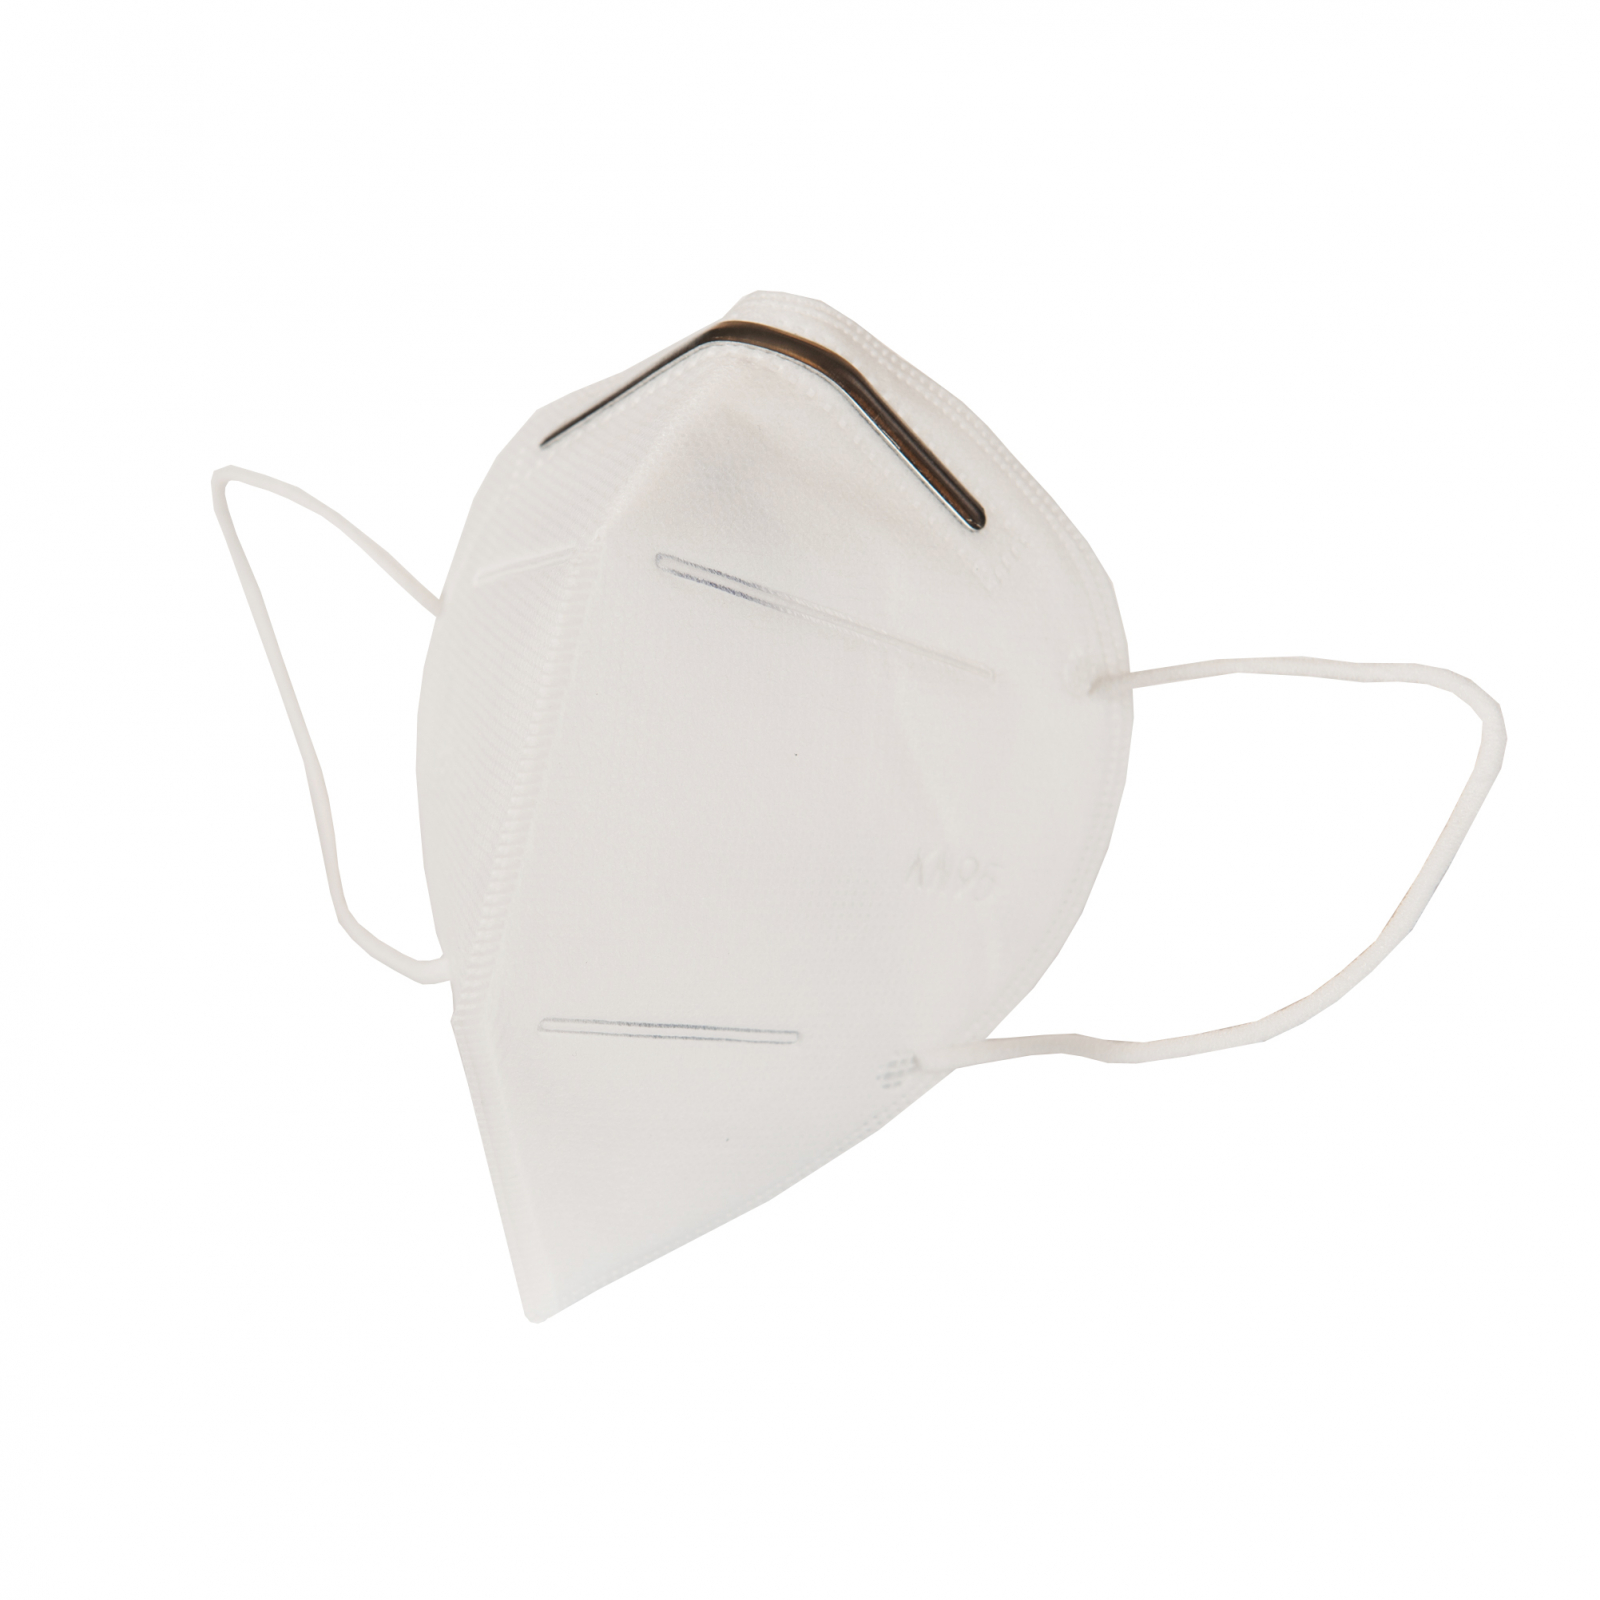 Set 20 bucati masca medicala KN95 4 straturi FFP2 sterile imagine